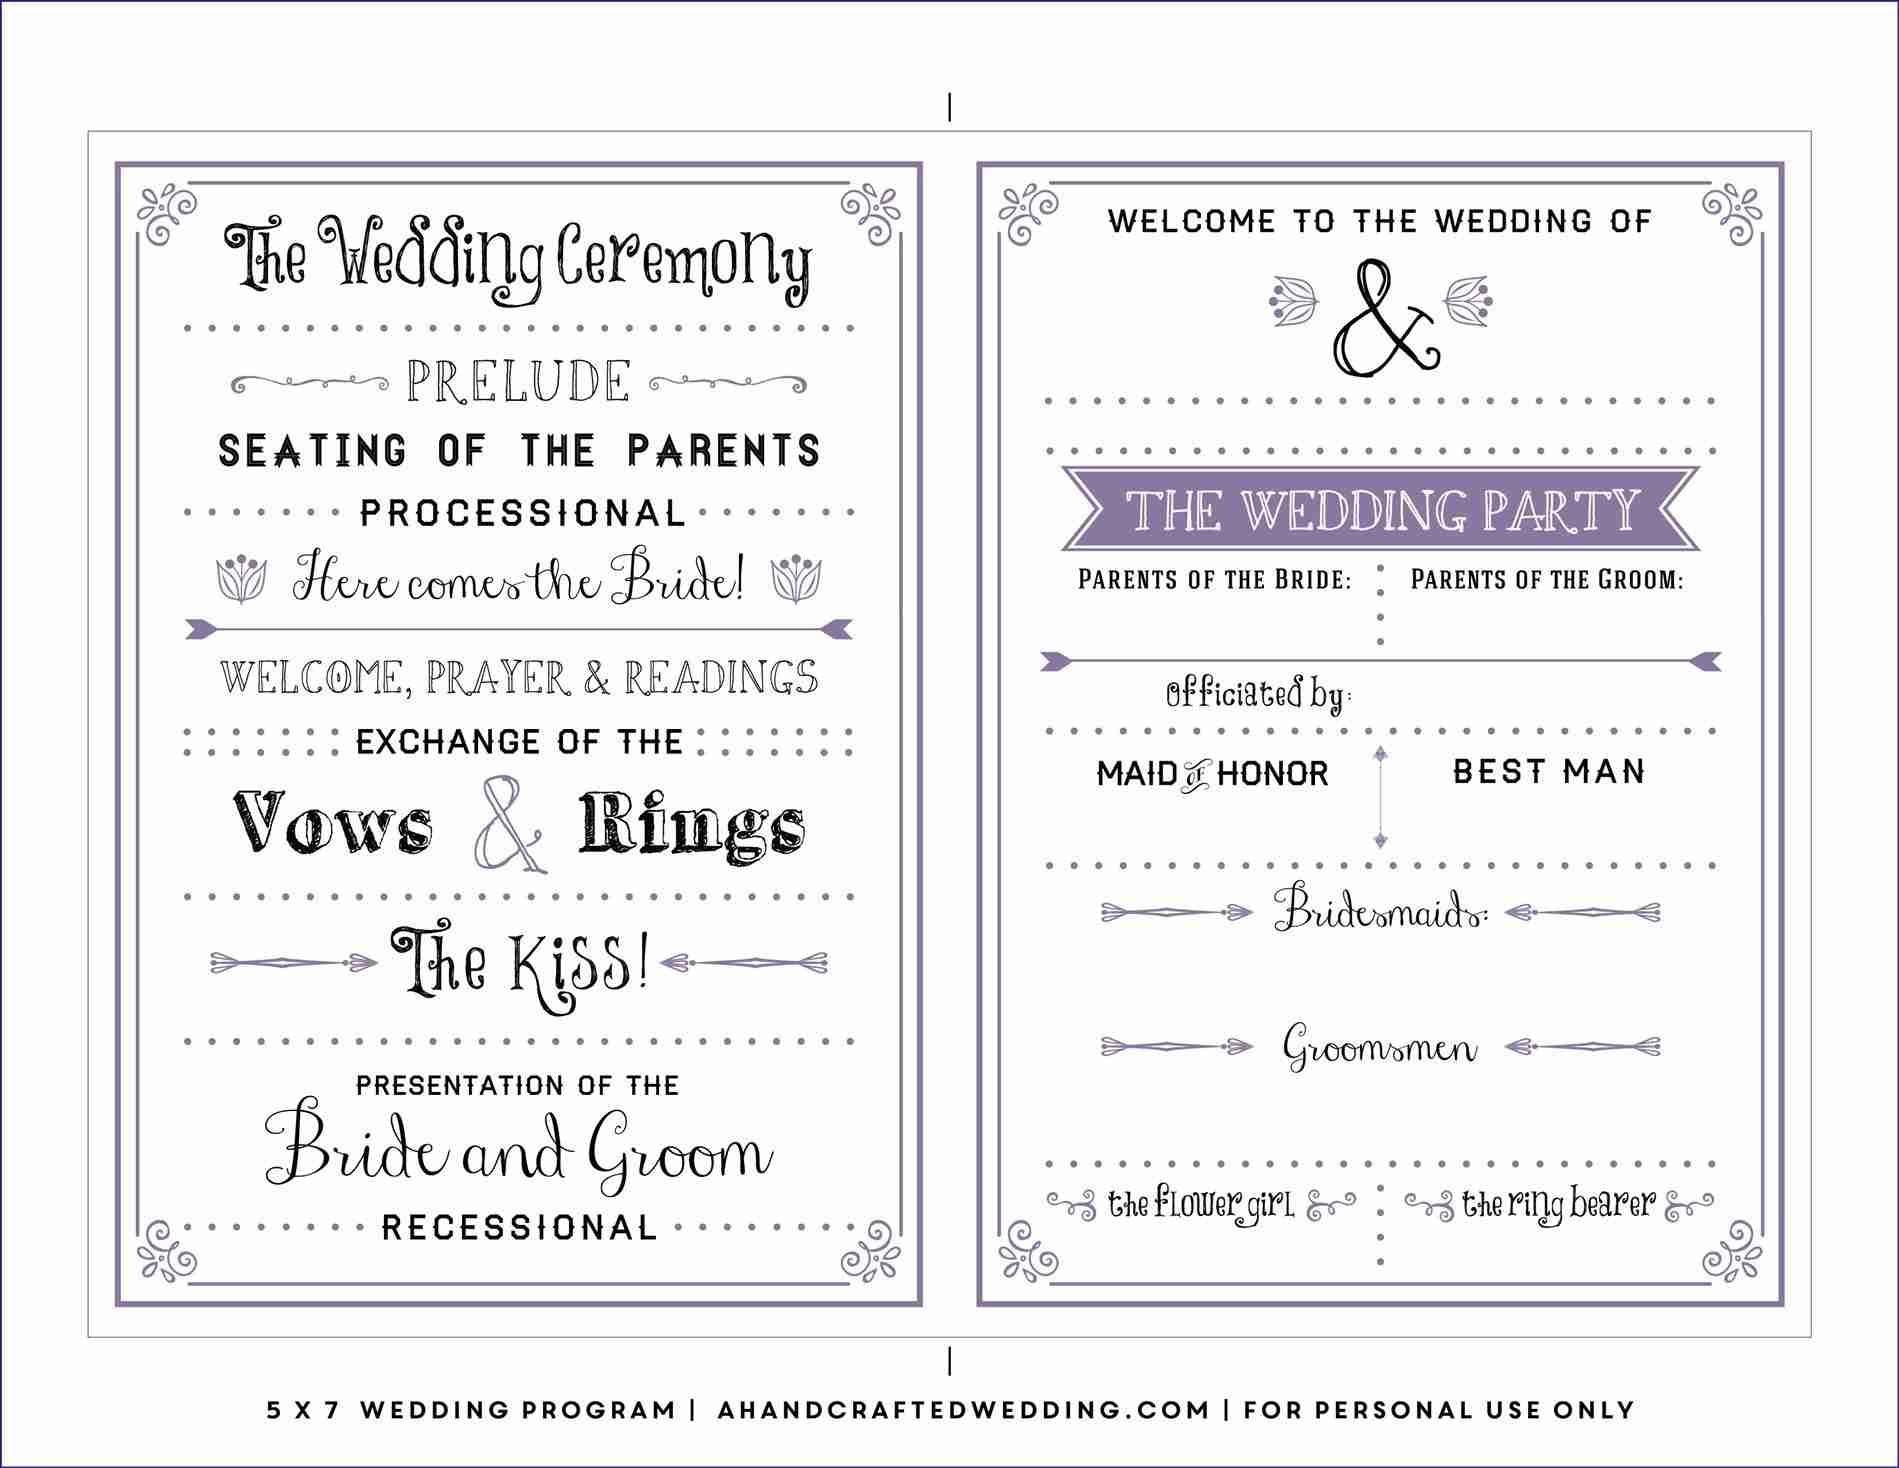 Free Downloadable Wedding Program Template That Can Be Printed - Free Printable Wedding Program Templates Word